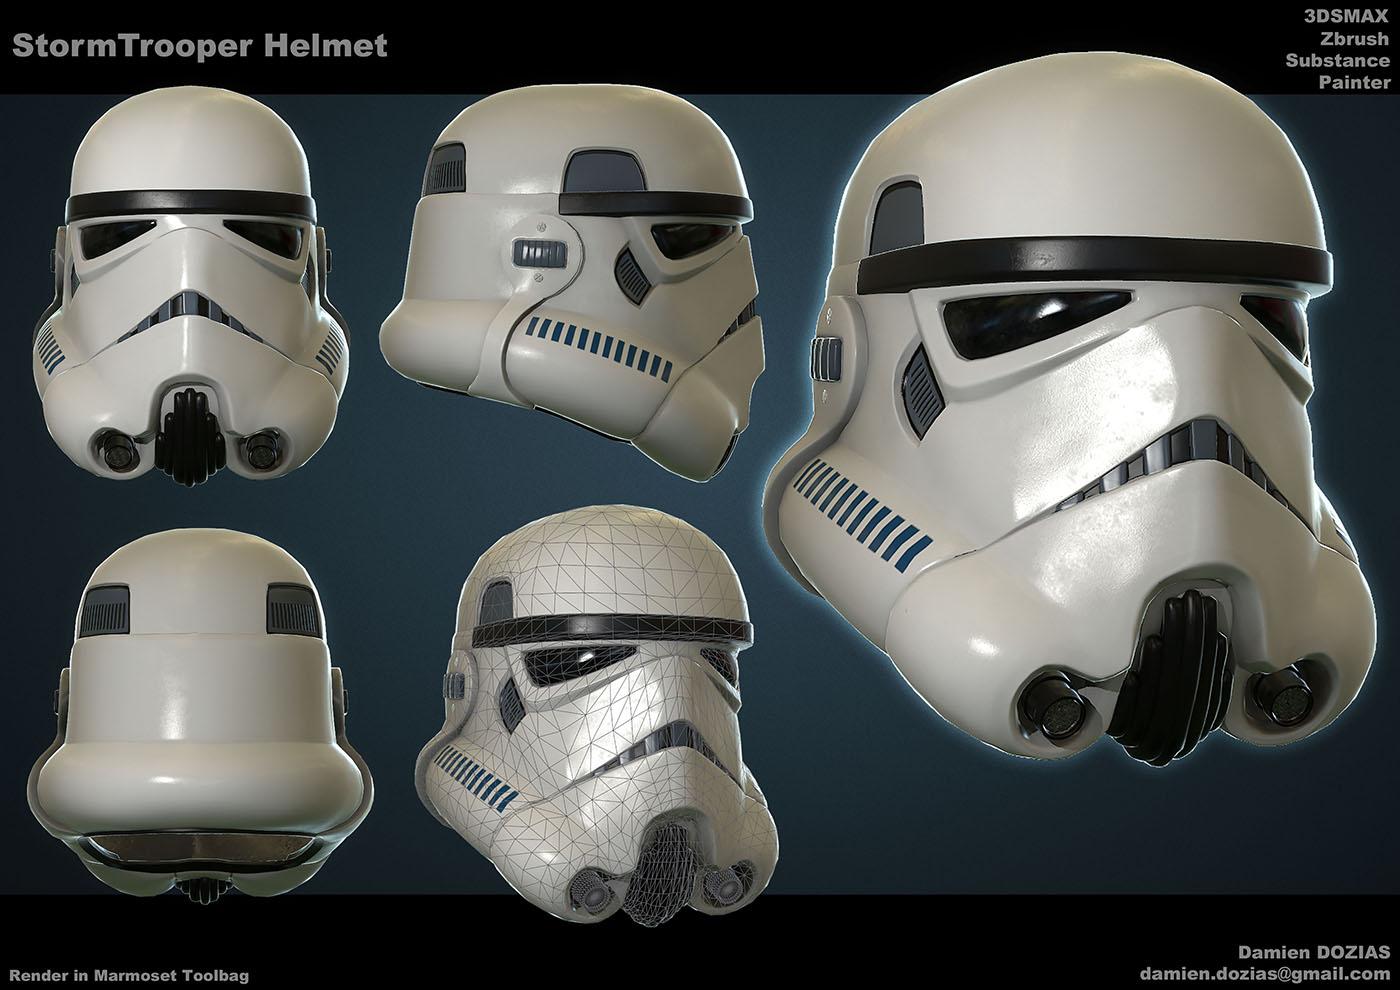 Stormtrooper helmet nude adult pic